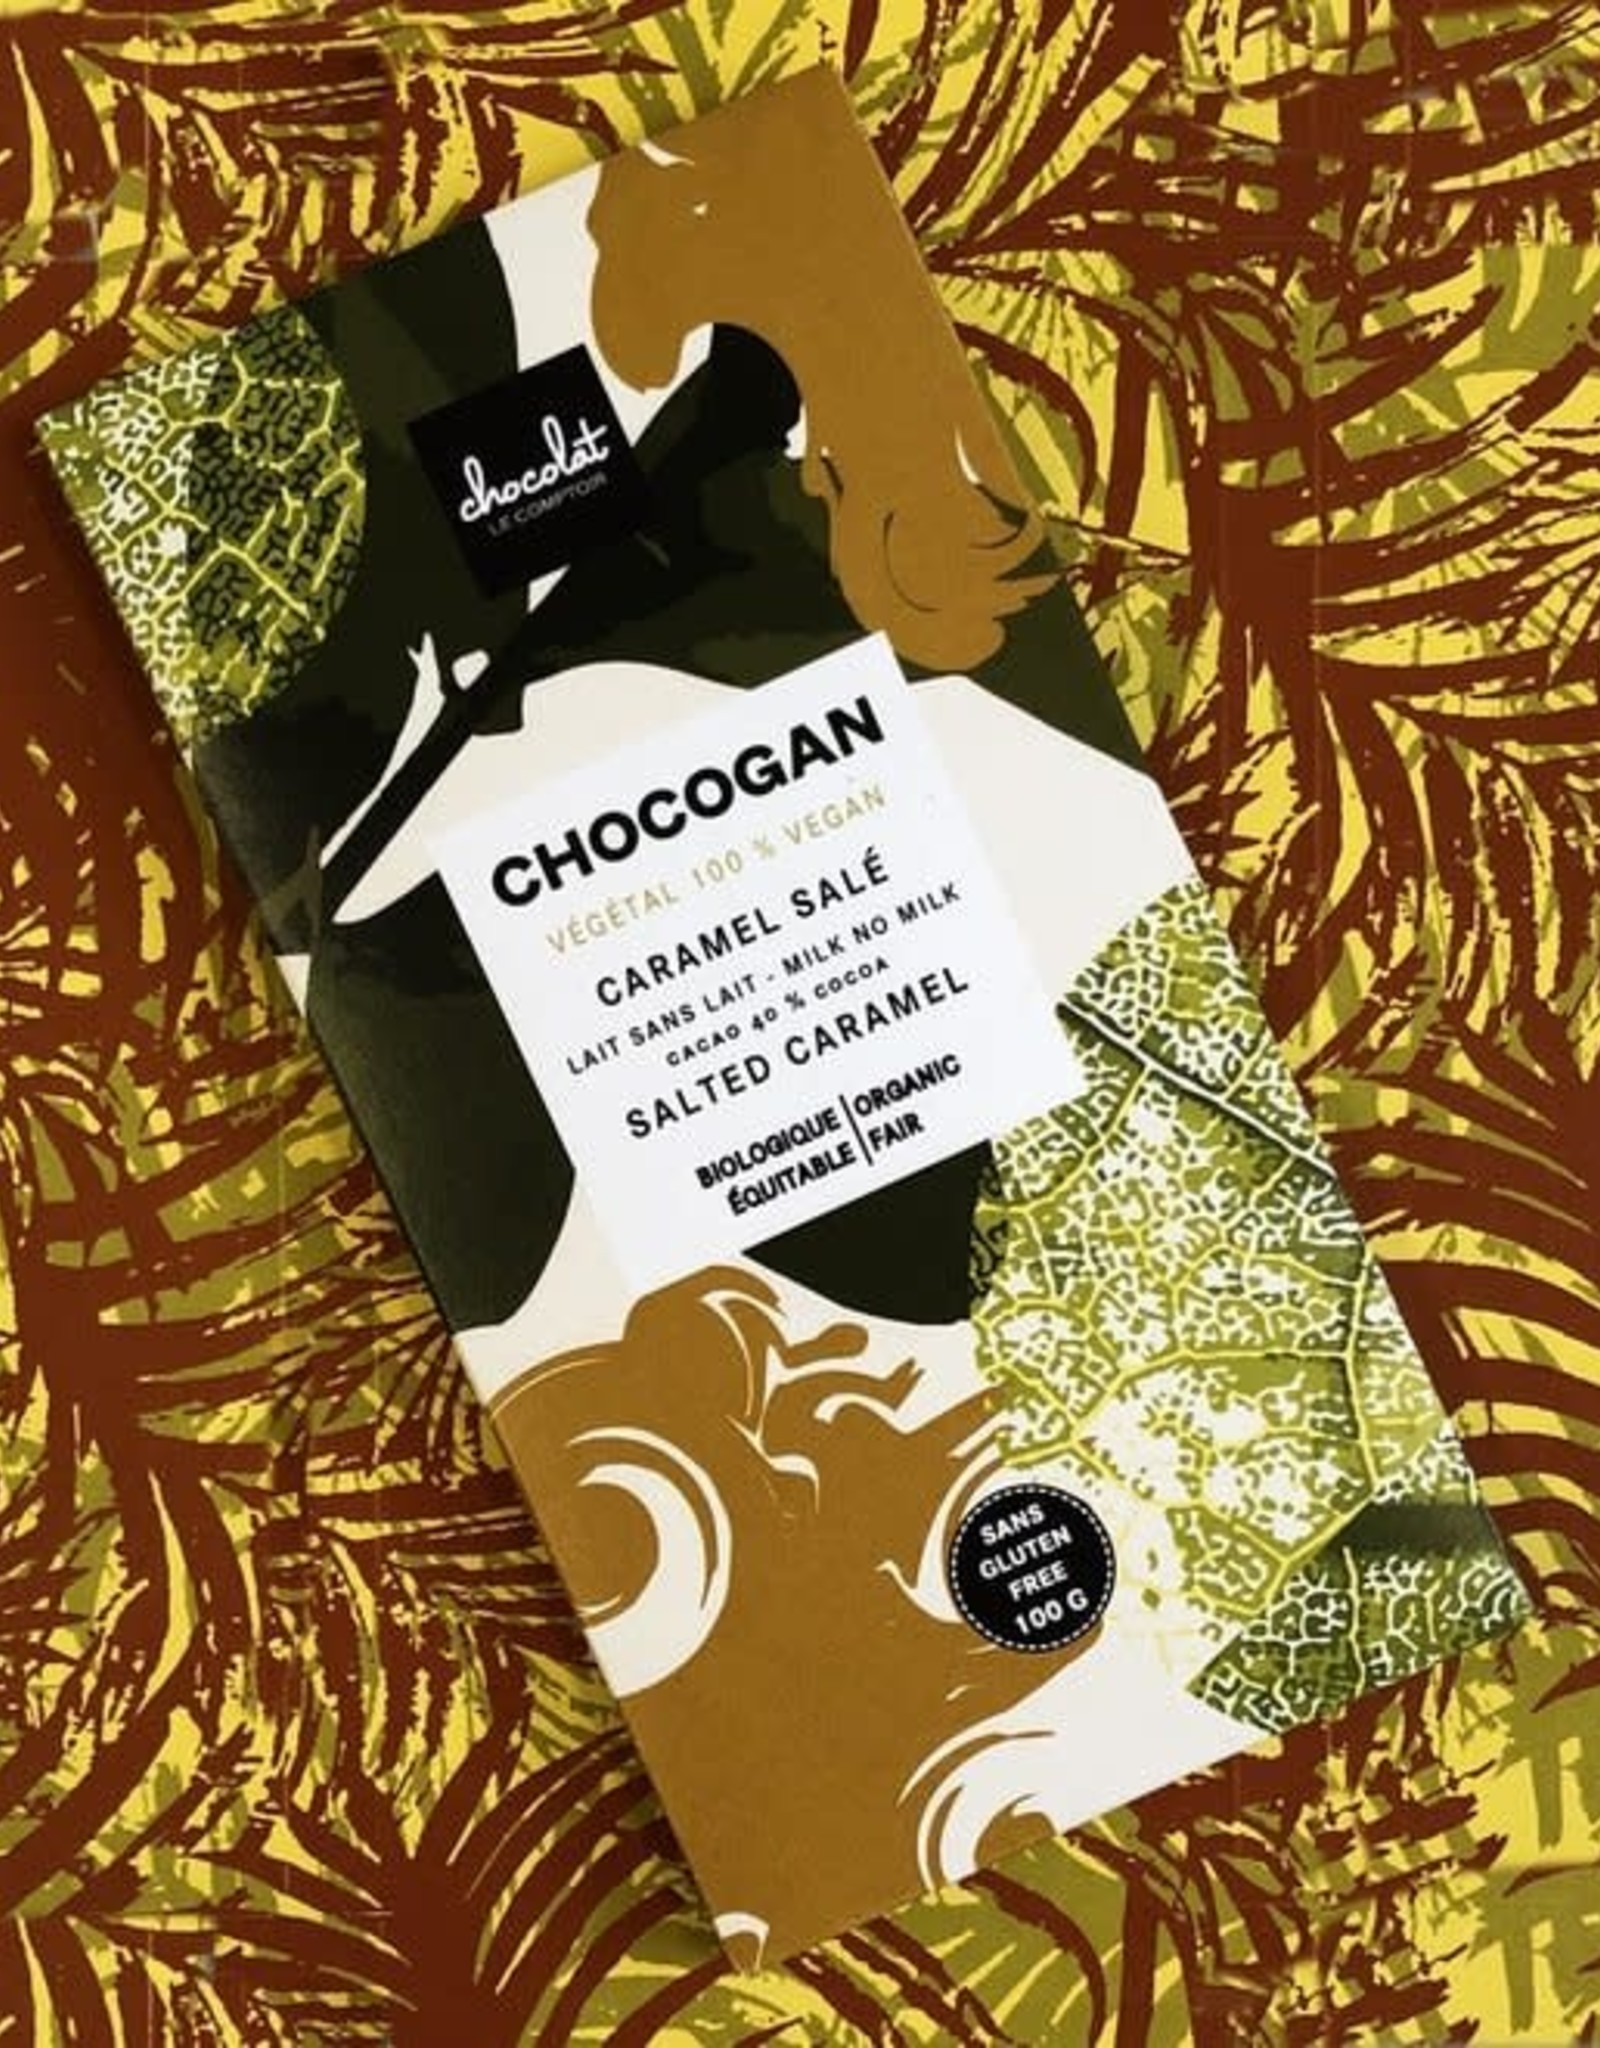 Le comptoir chocolat CHOCOGAN - Chocolat au lait - Caramel salé